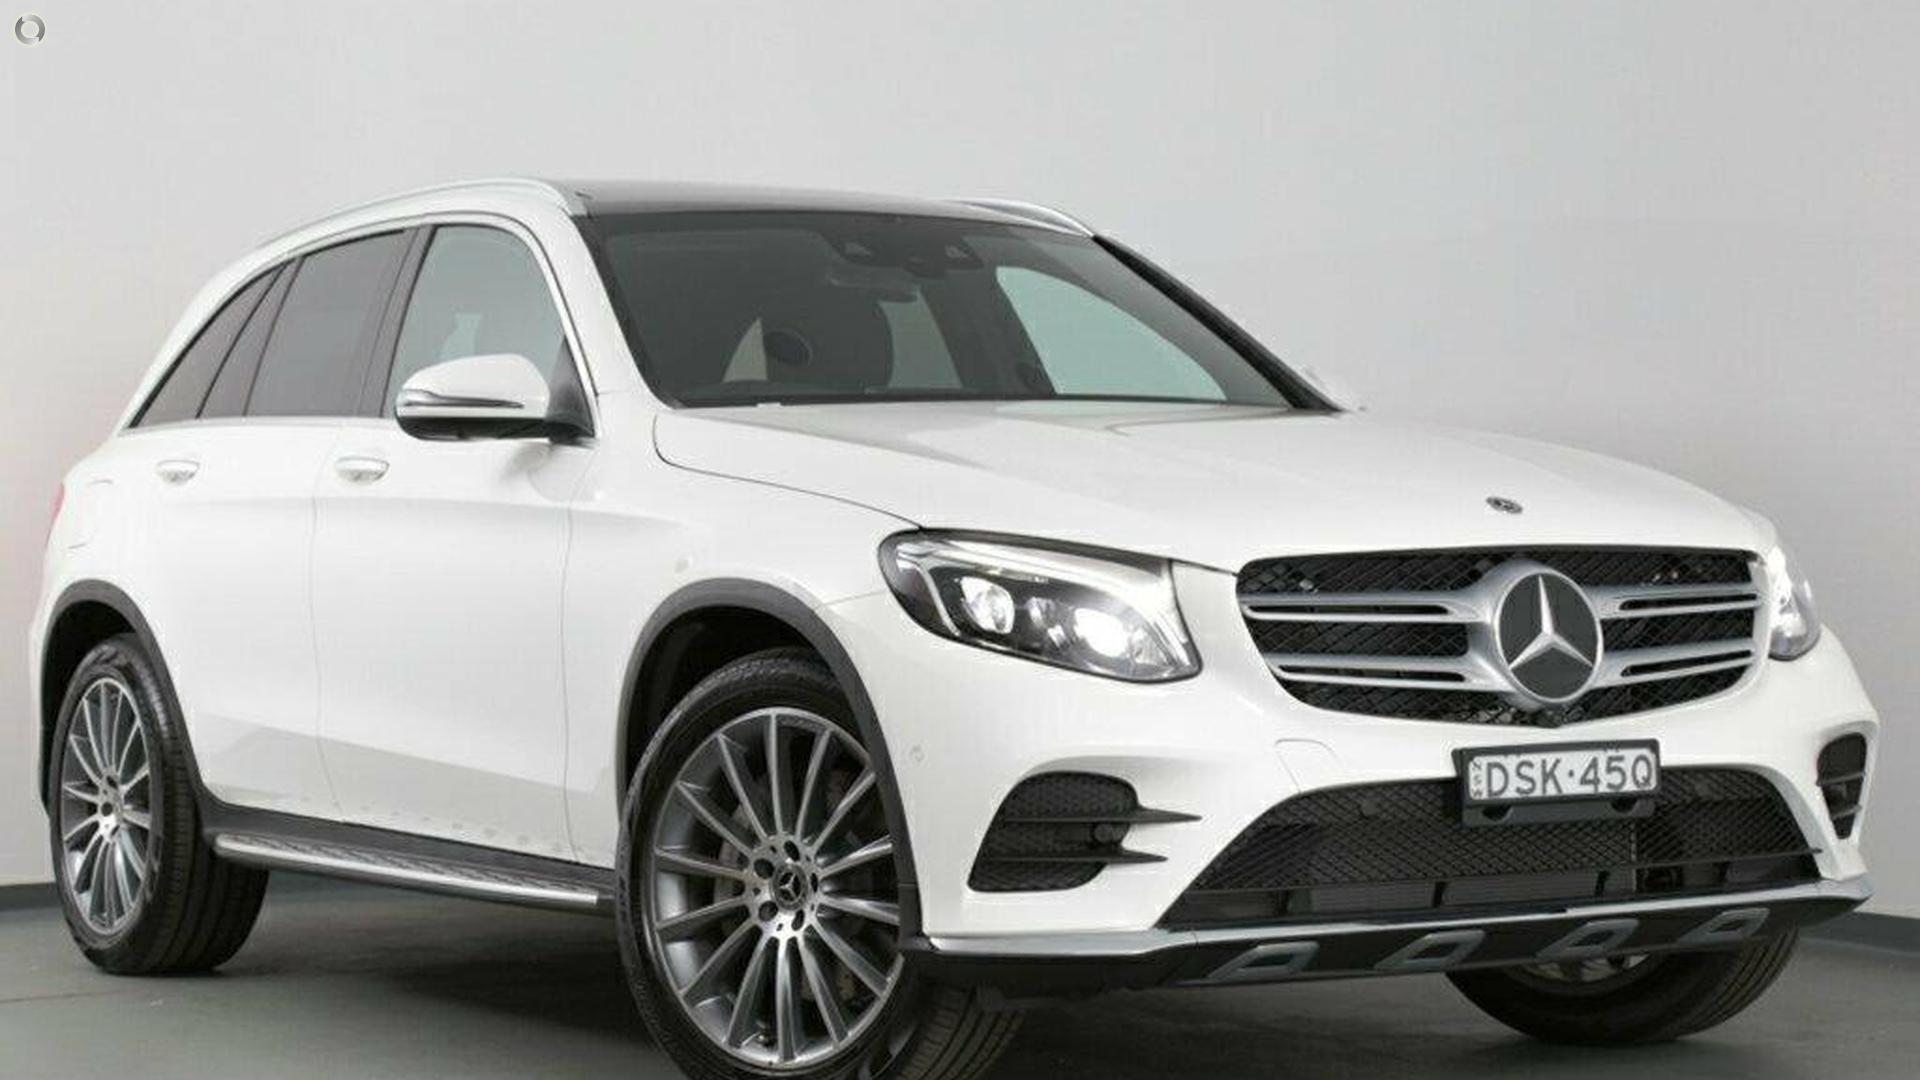 2017 mercedes benz glc 250 wagon mercedes benz for Mercedes benz financial contact